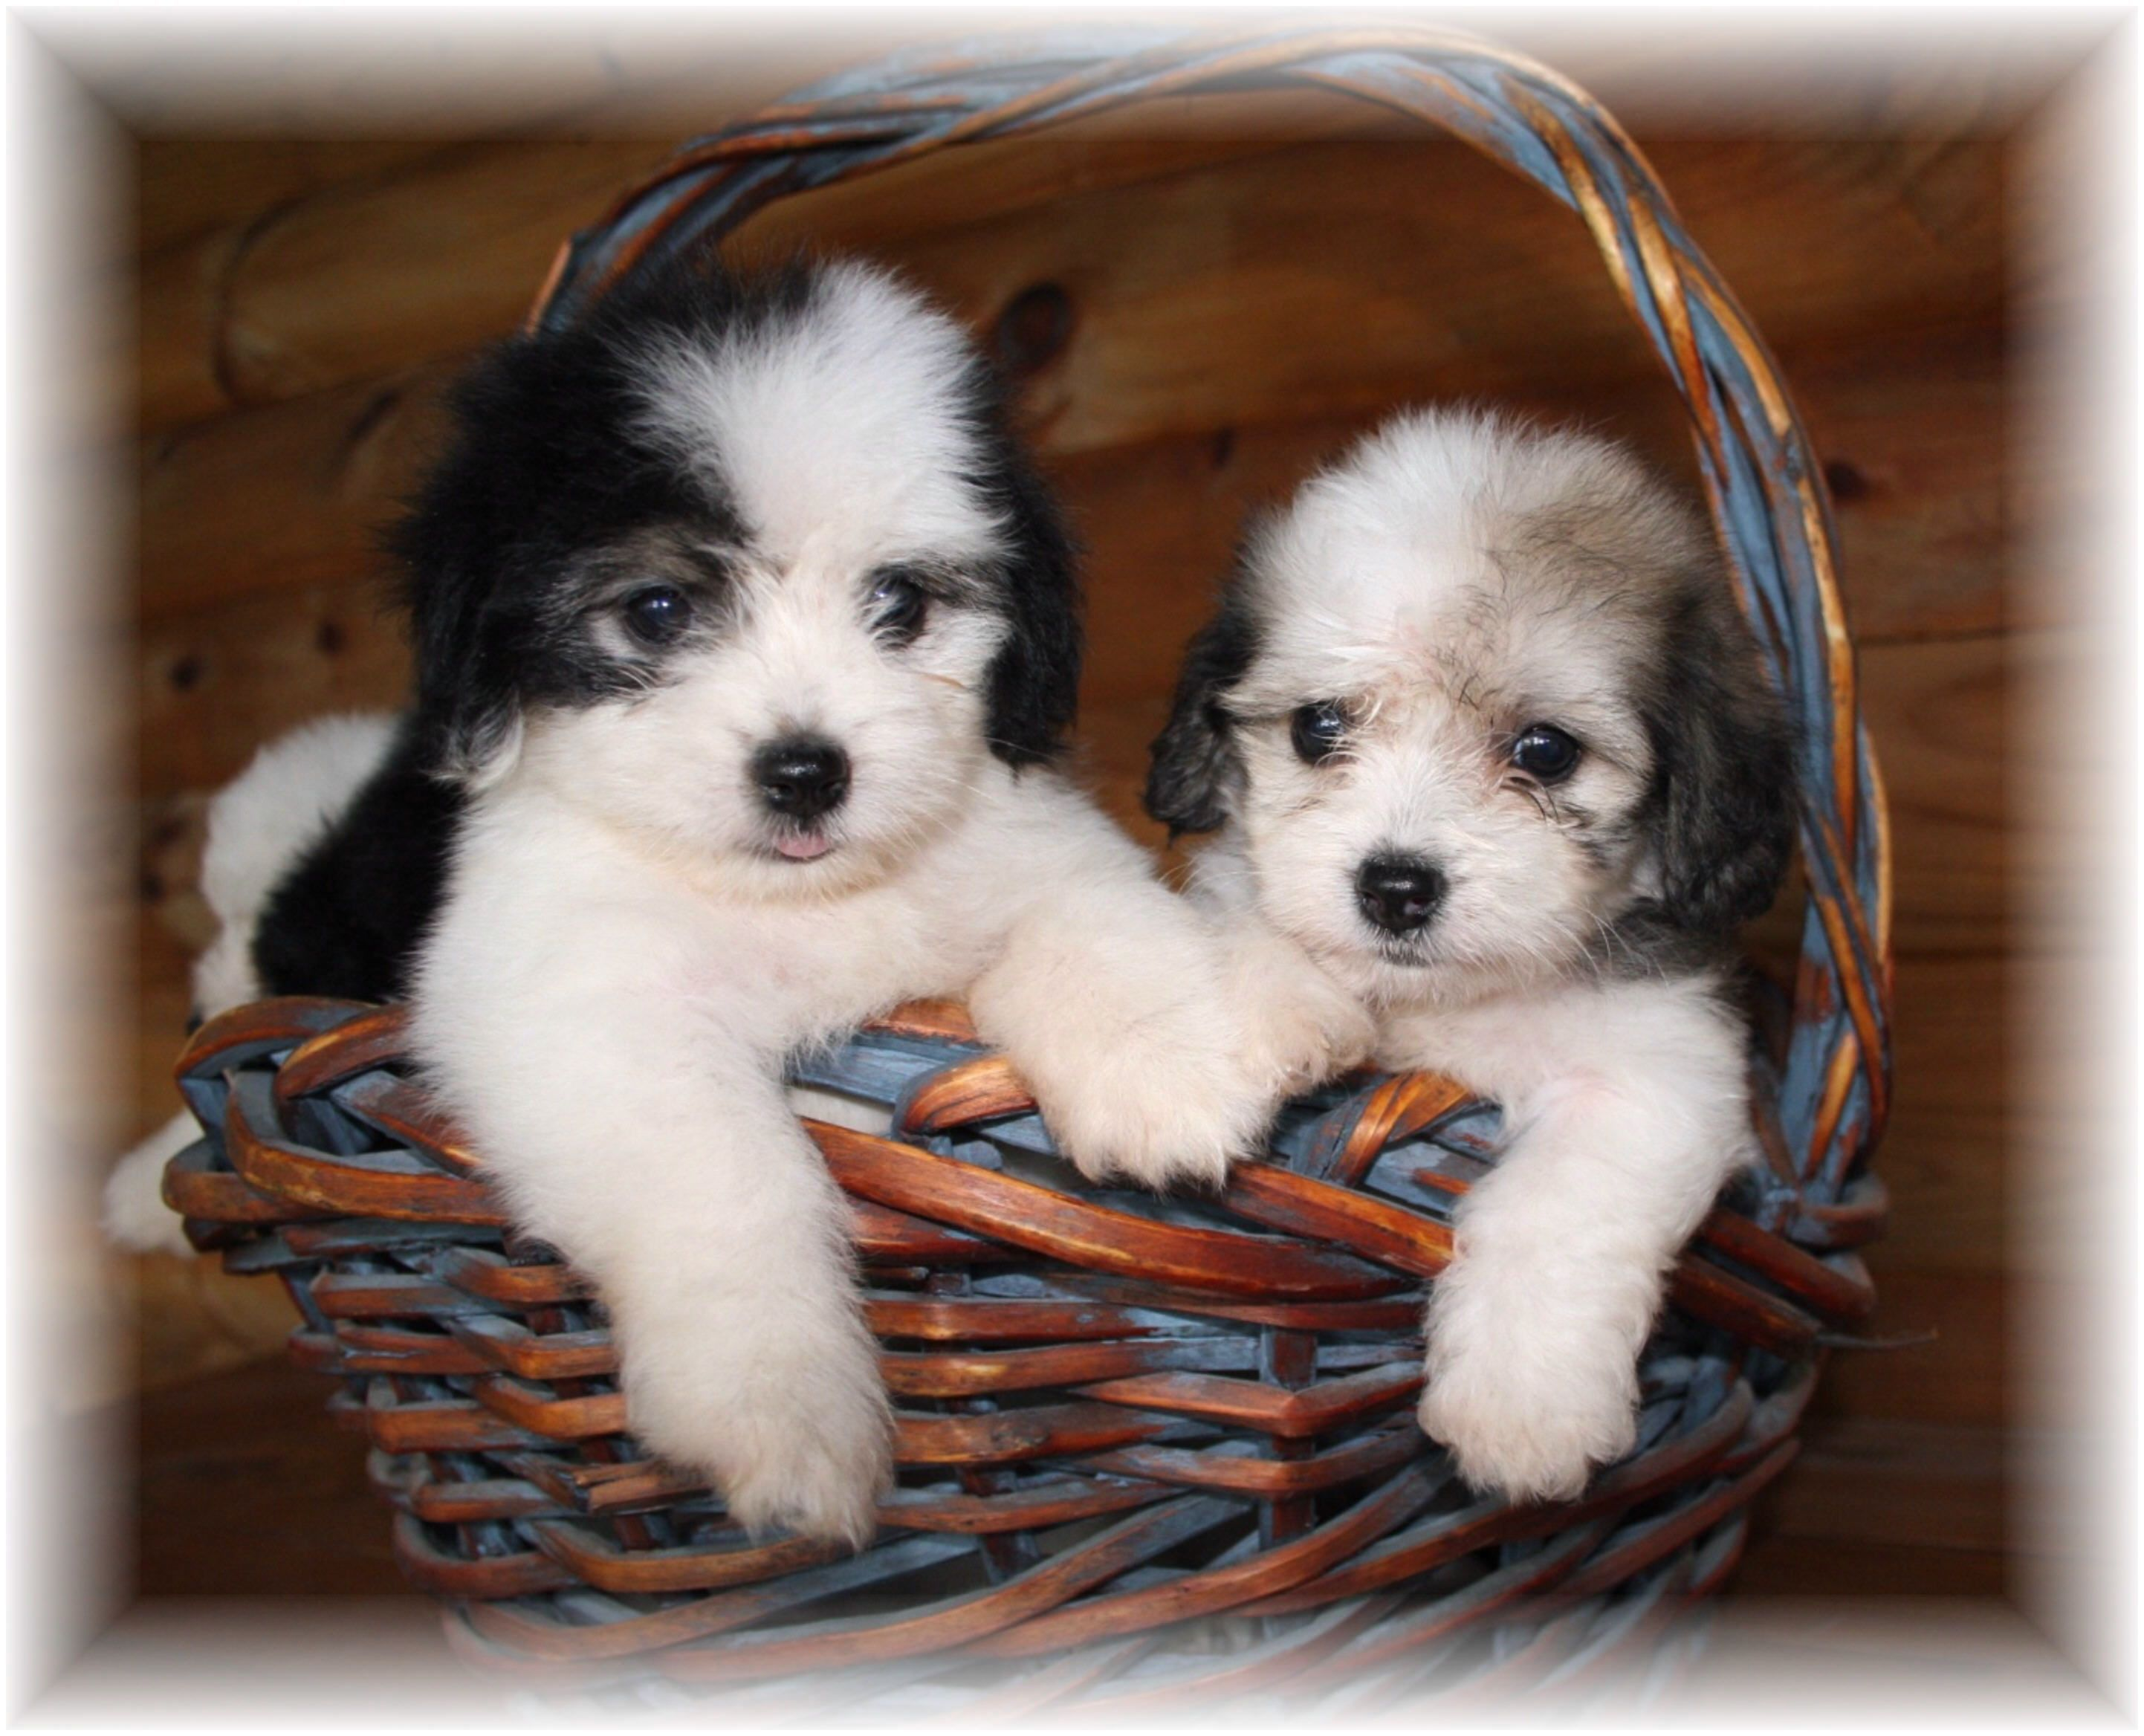 Havanese Intelligent And Funny Havanese Puppies Havanese Dogs Havanese